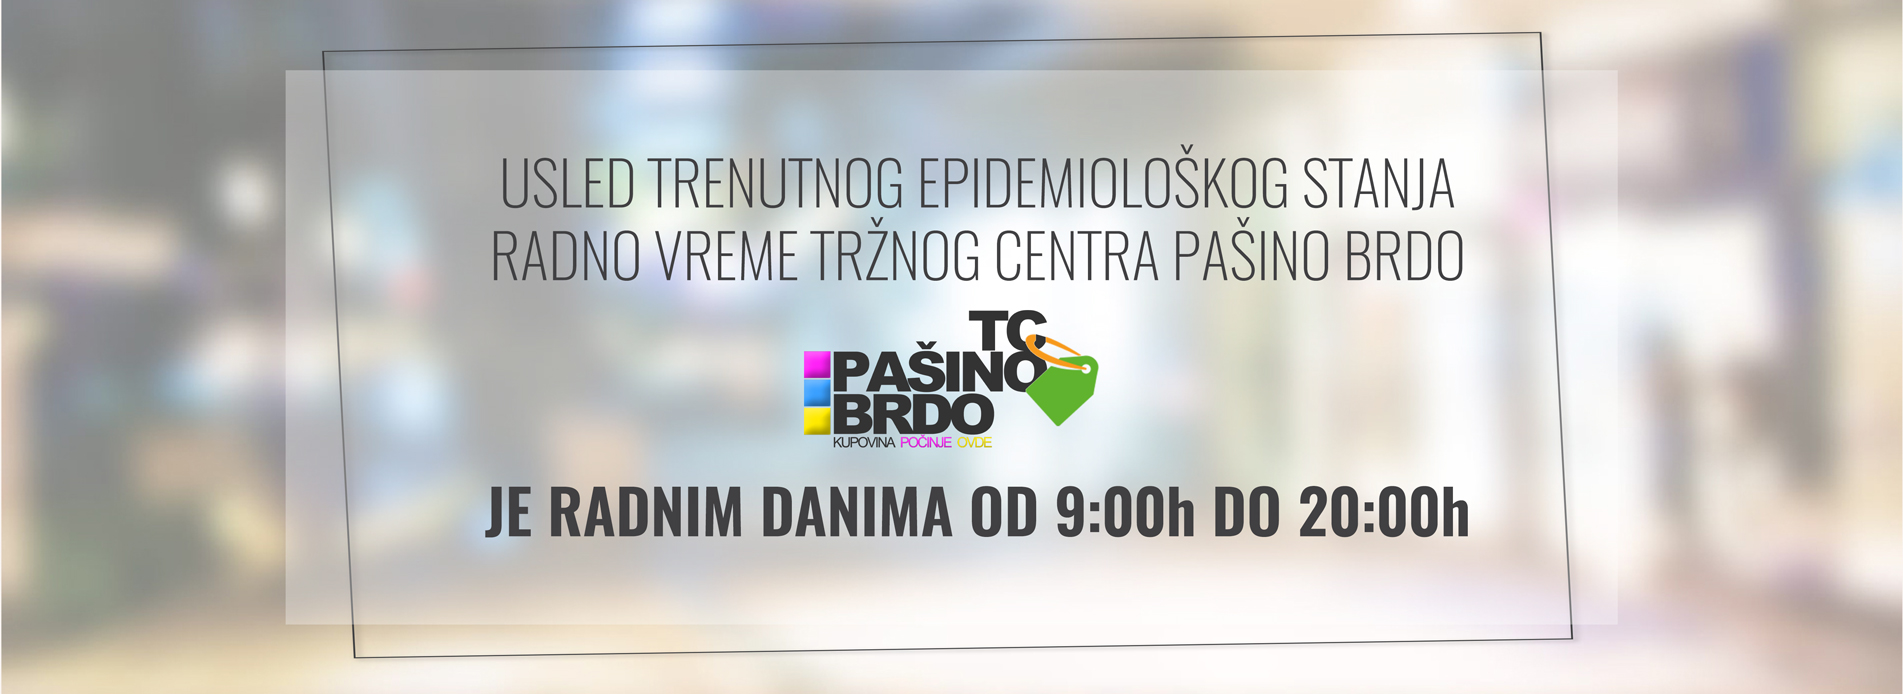 covid2019-radno-vreme-pb